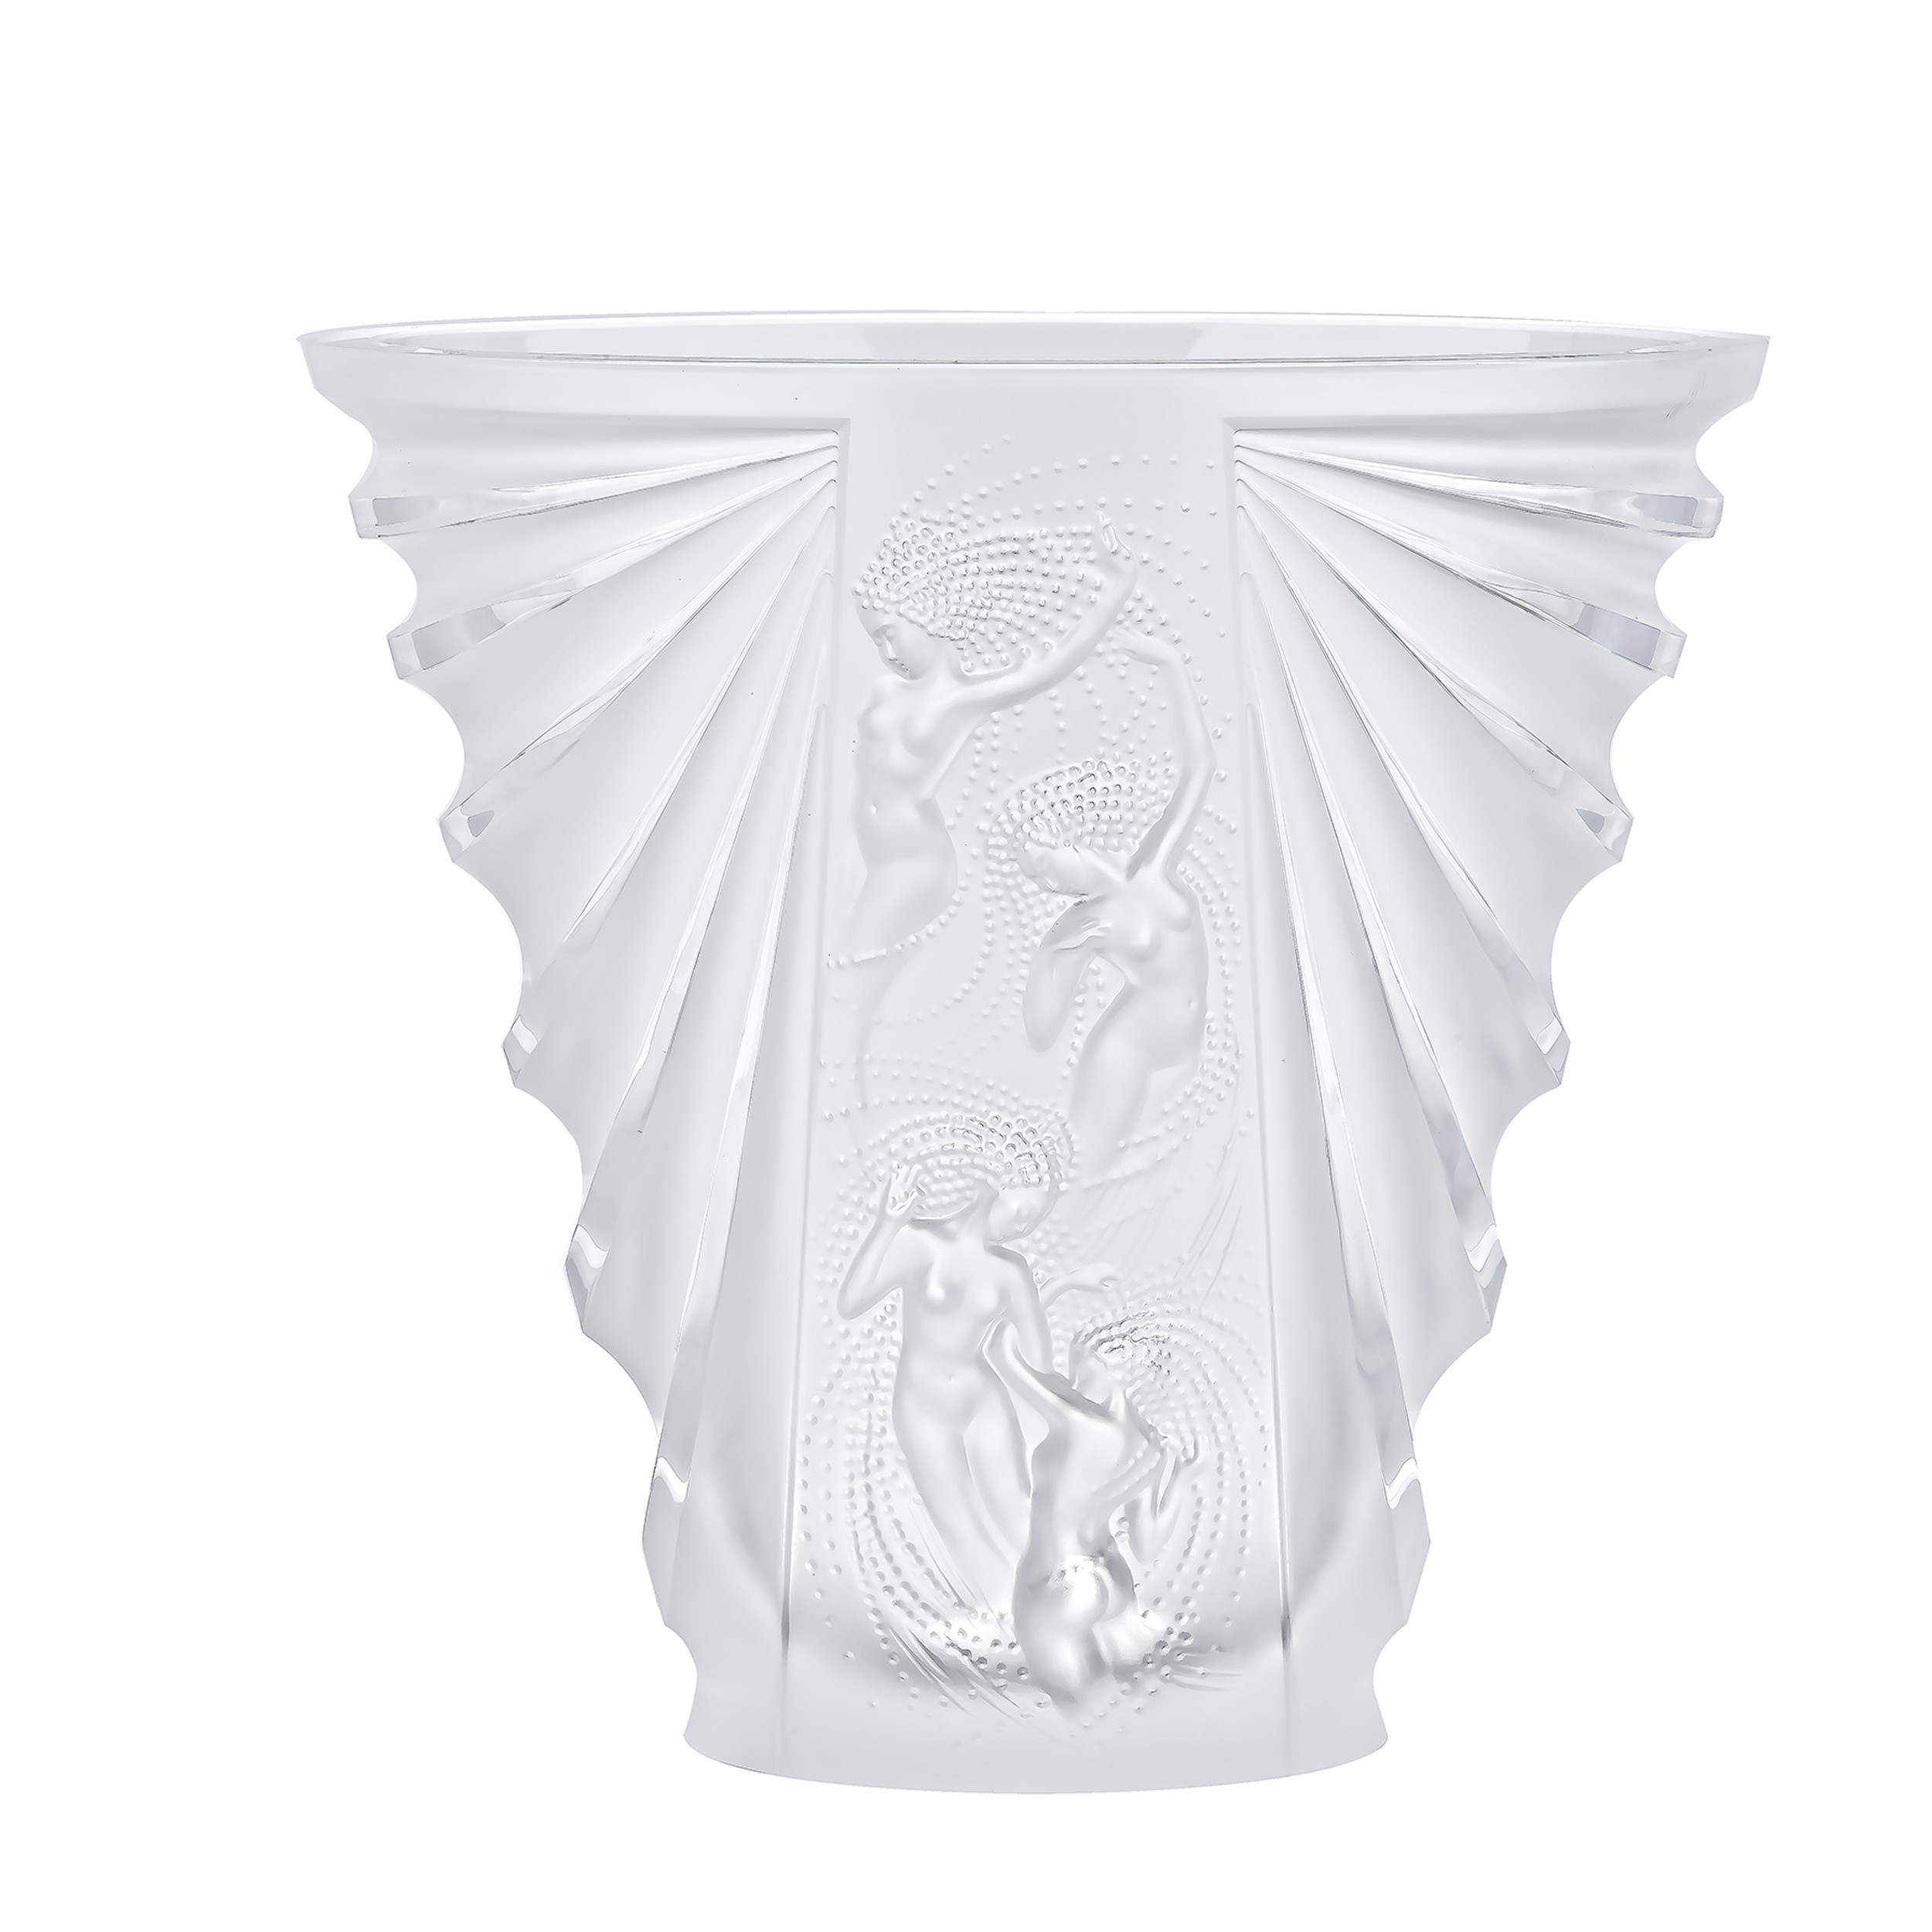 Naiade vase ornament